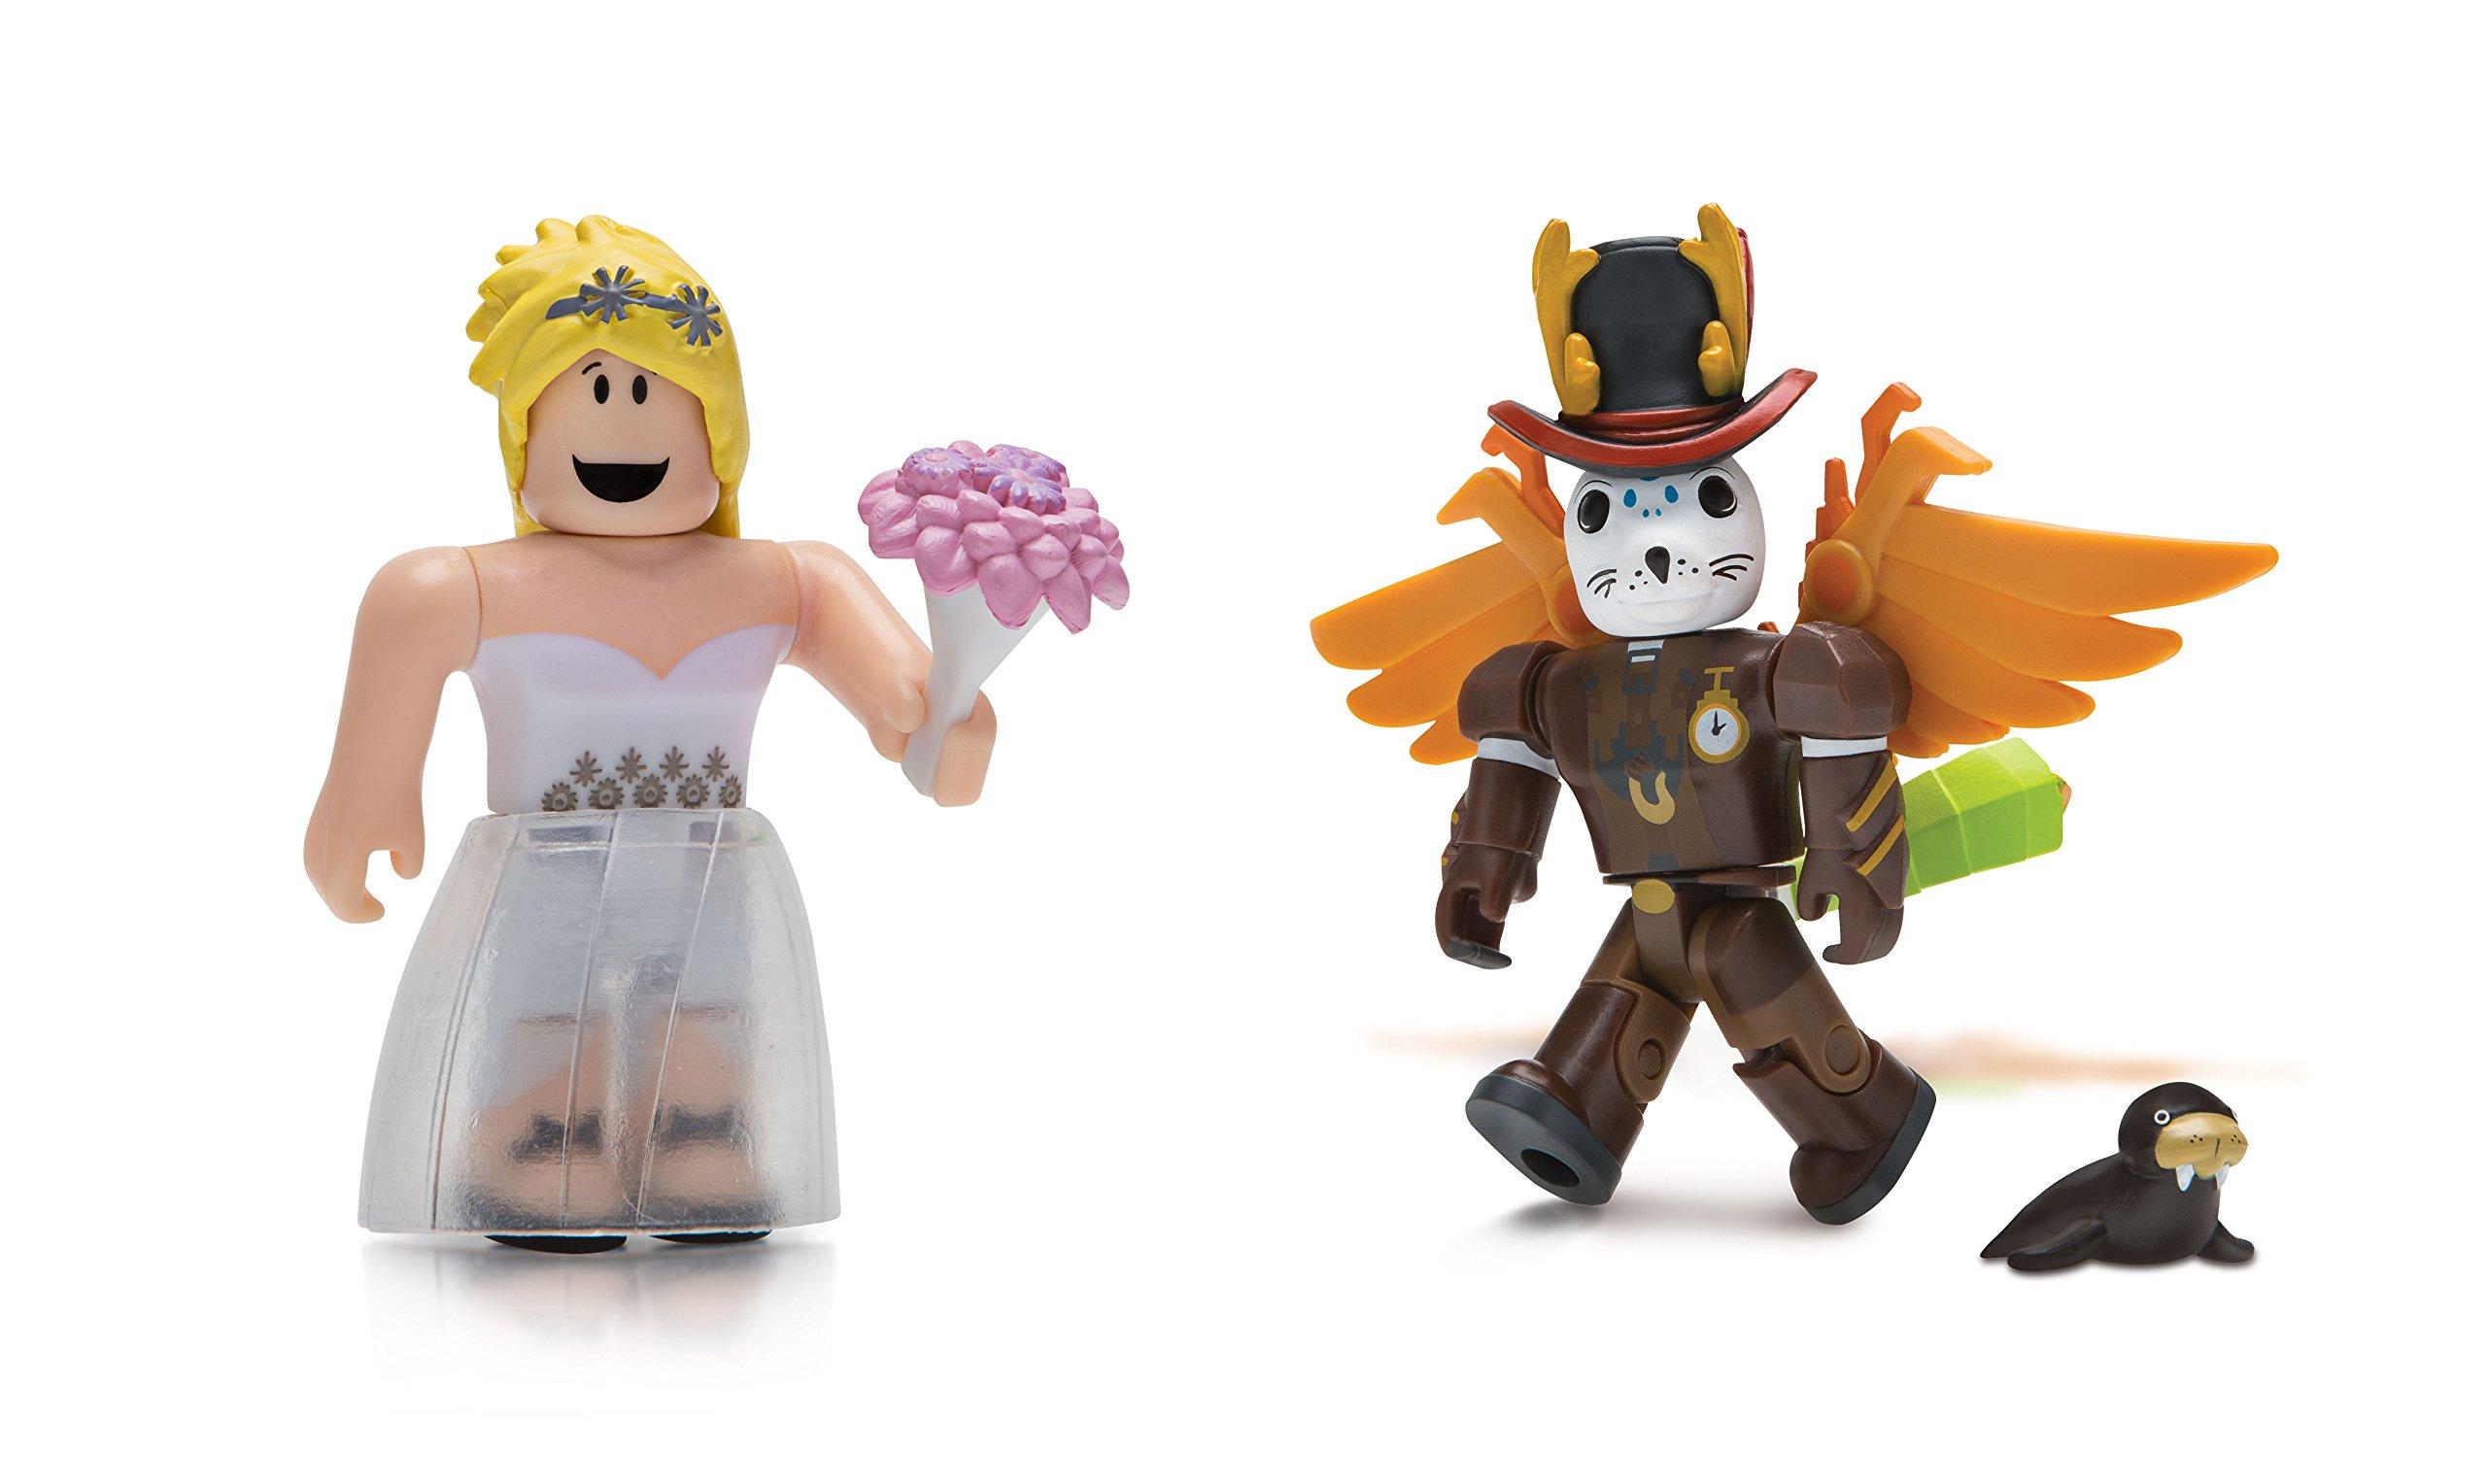 Roblox Celebrity Collection - Vorlias + Bride Two Figure Bundle [Includes 2 Exclusive Virtual Items]